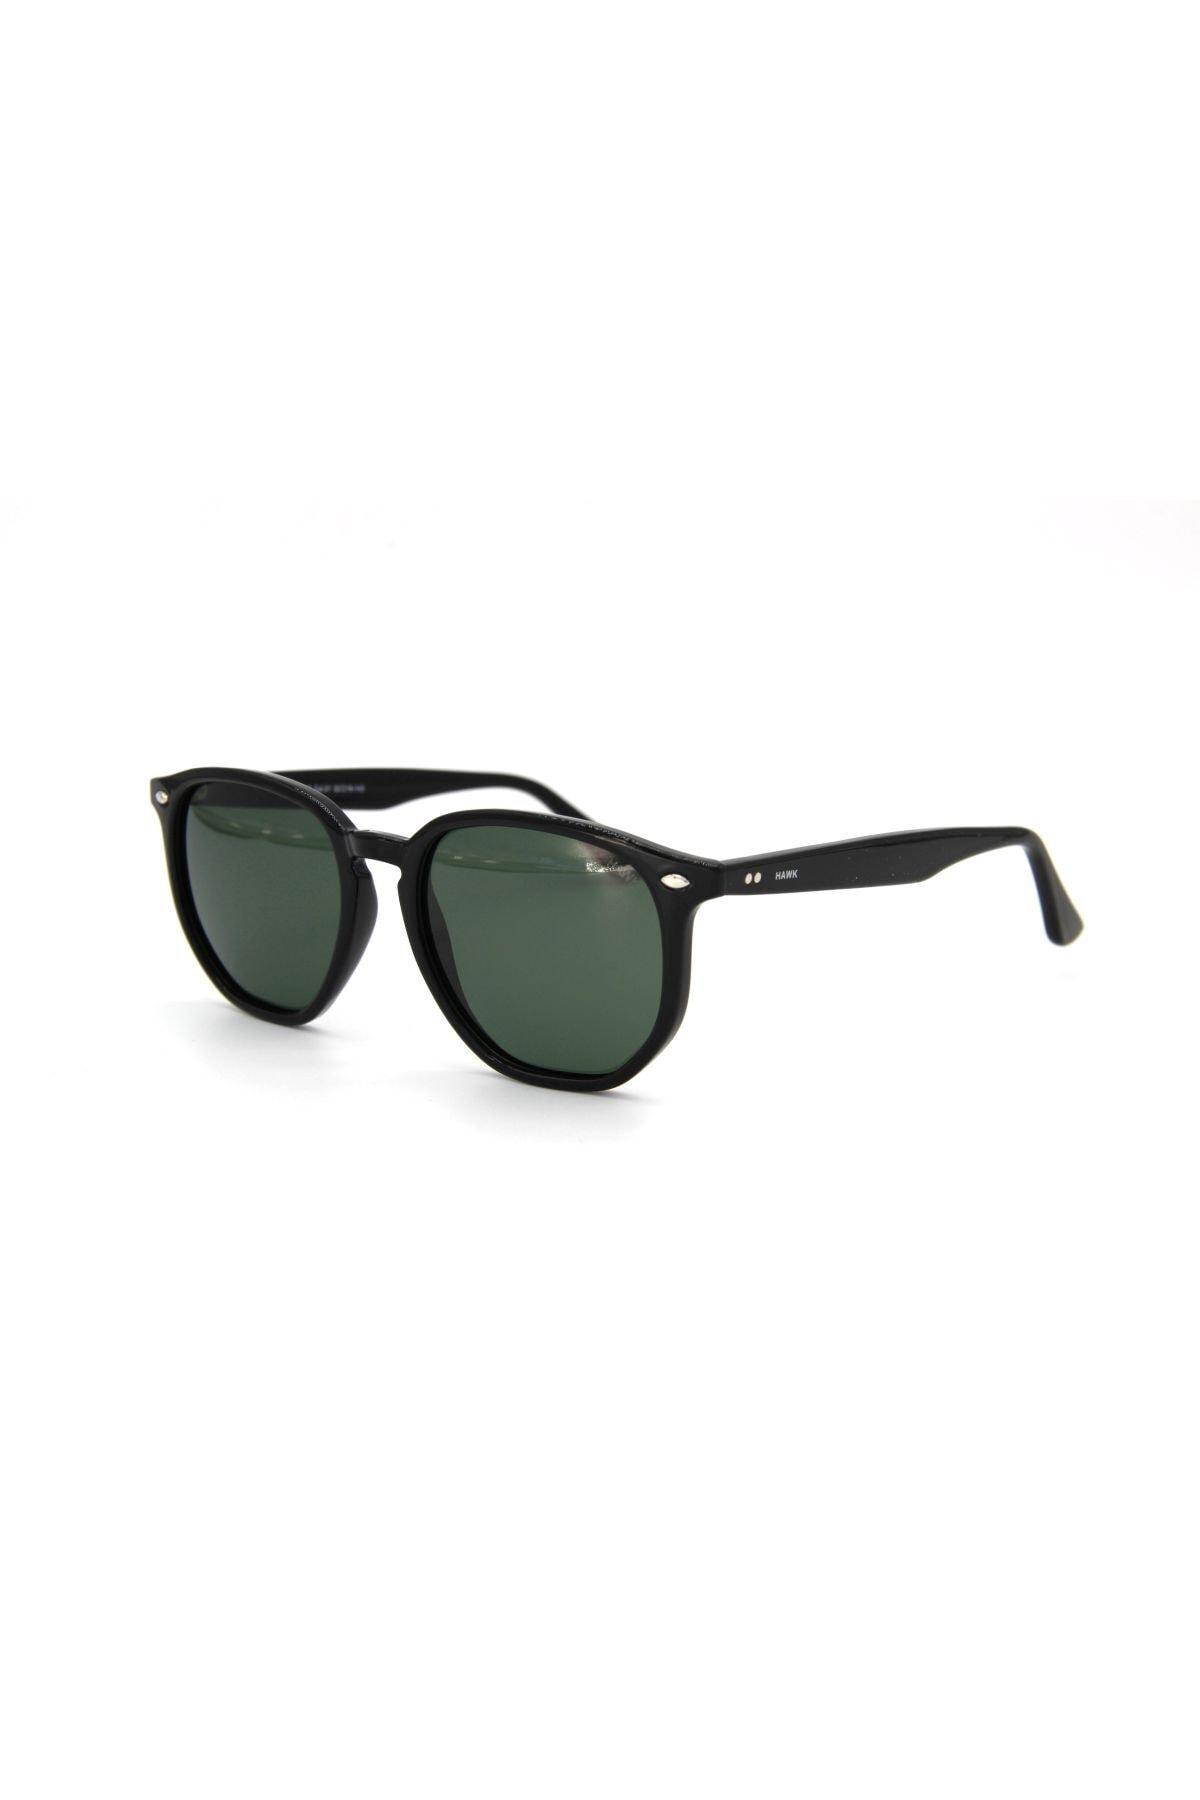 فروش عینک آفتابی یونیسکس جدید برند HAWK رنگ مشکی کد ty99061722